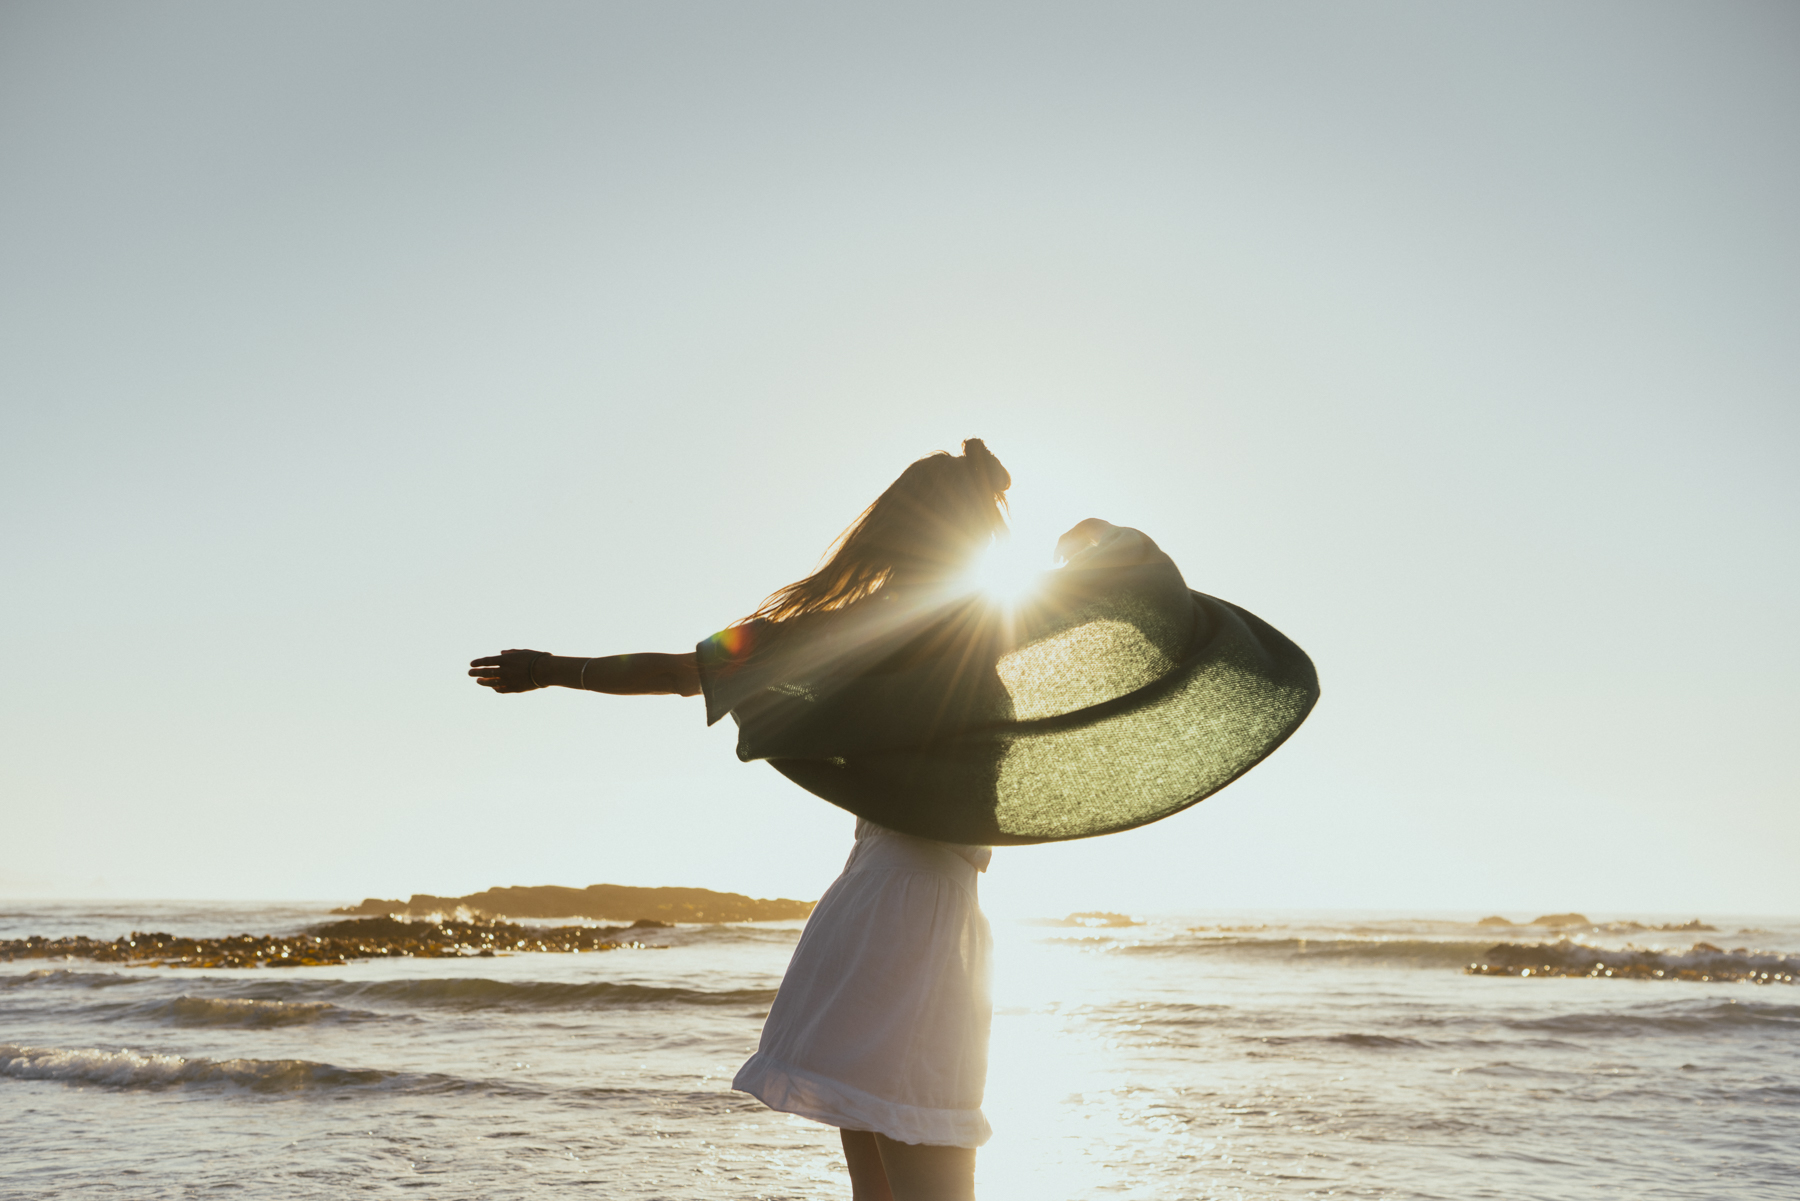 Dancing on the beach2.jpg